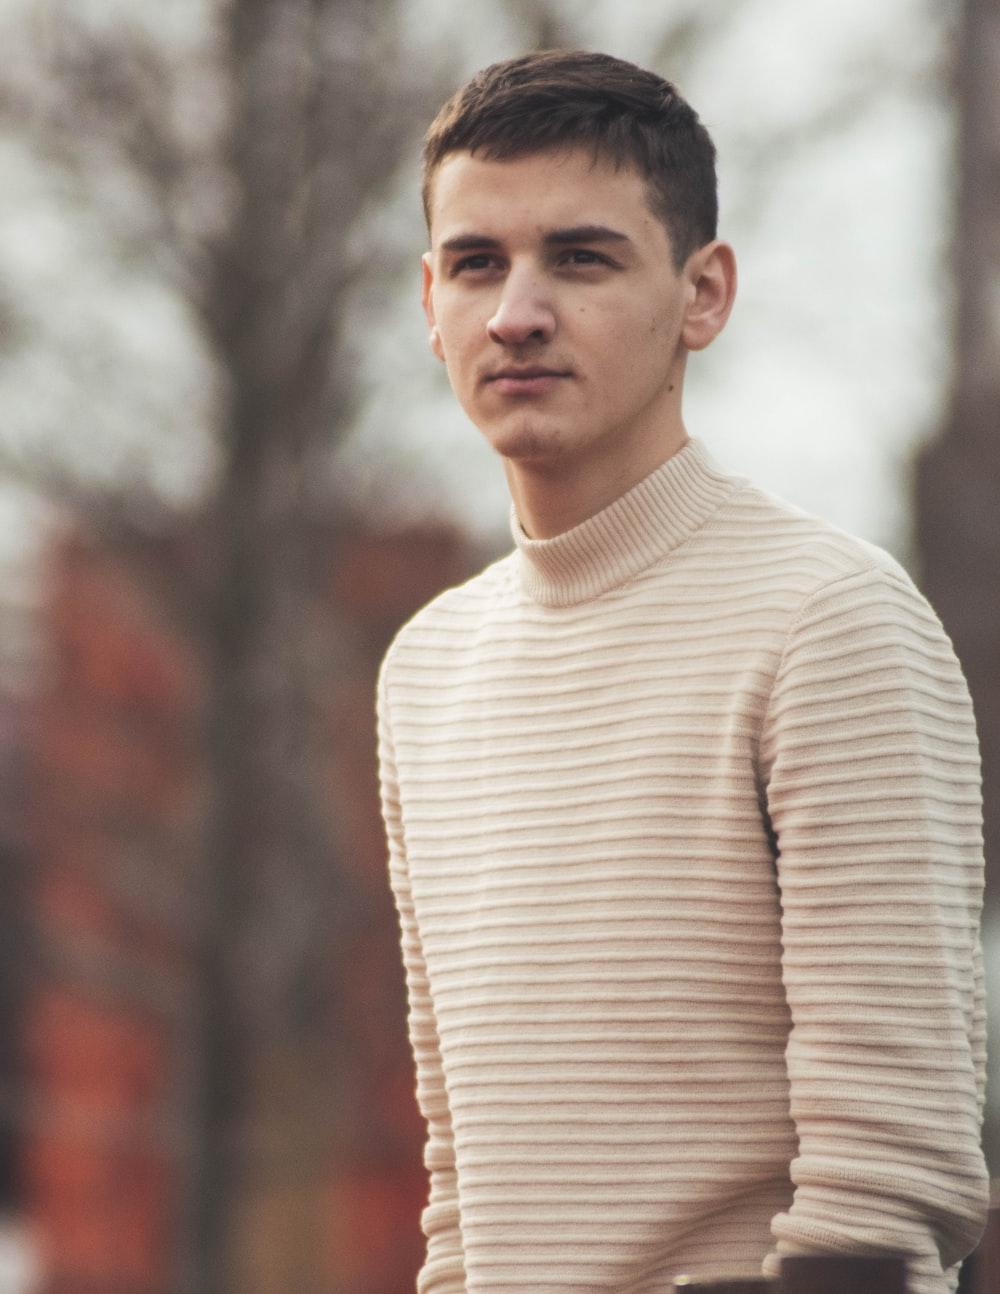 man in white turtleneck sweater